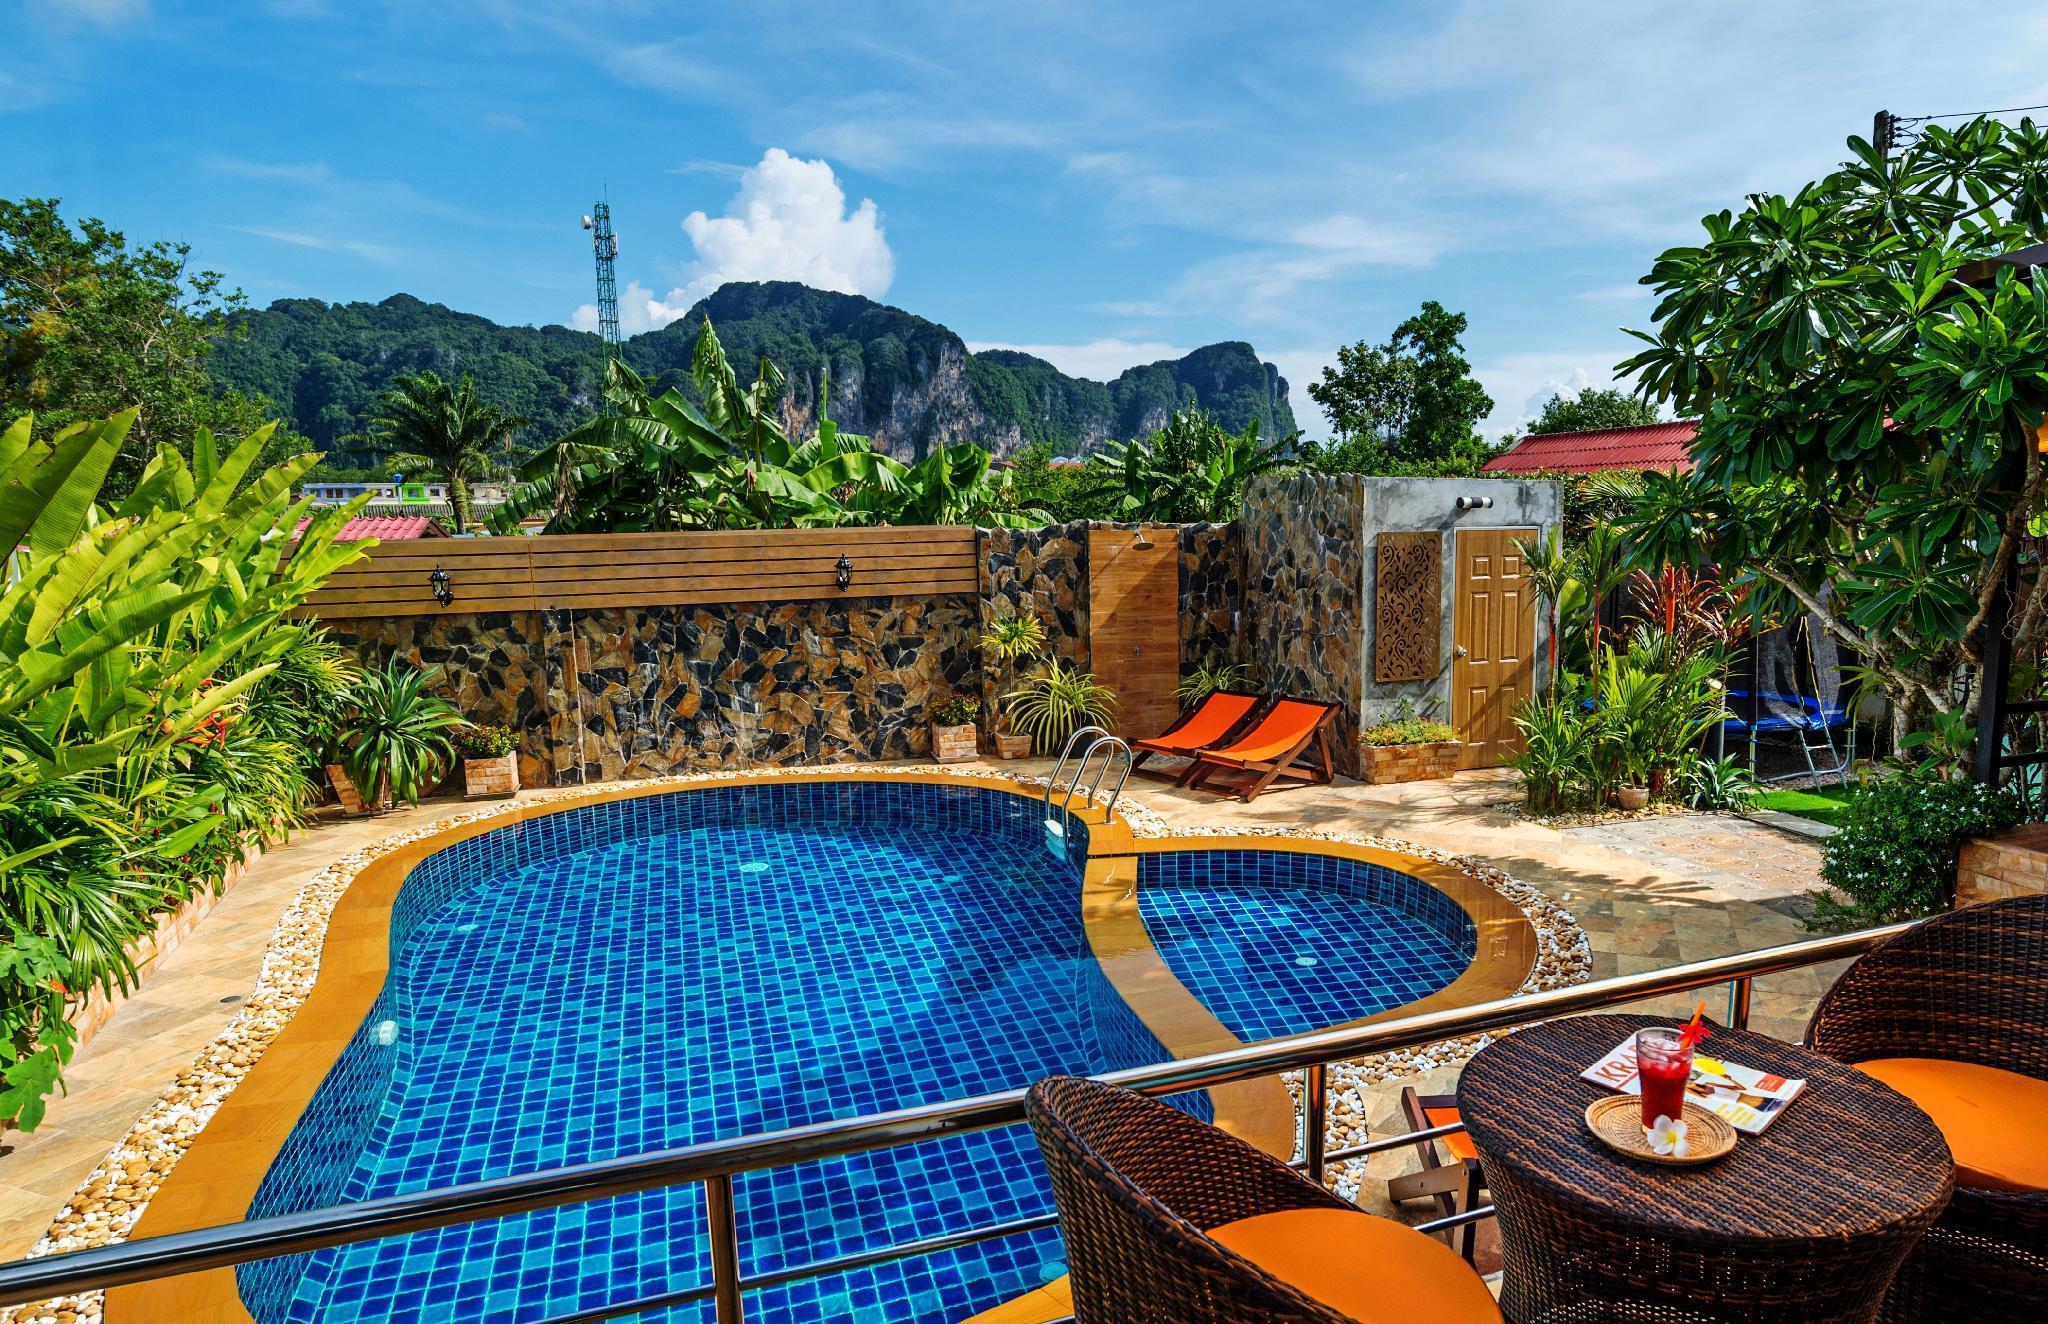 Ao Nang SERENE private pool villa วิลลา 3 ห้องนอน 3 ห้องน้ำส่วนตัว ขนาด 375 ตร.ม. – อ่าวนาง